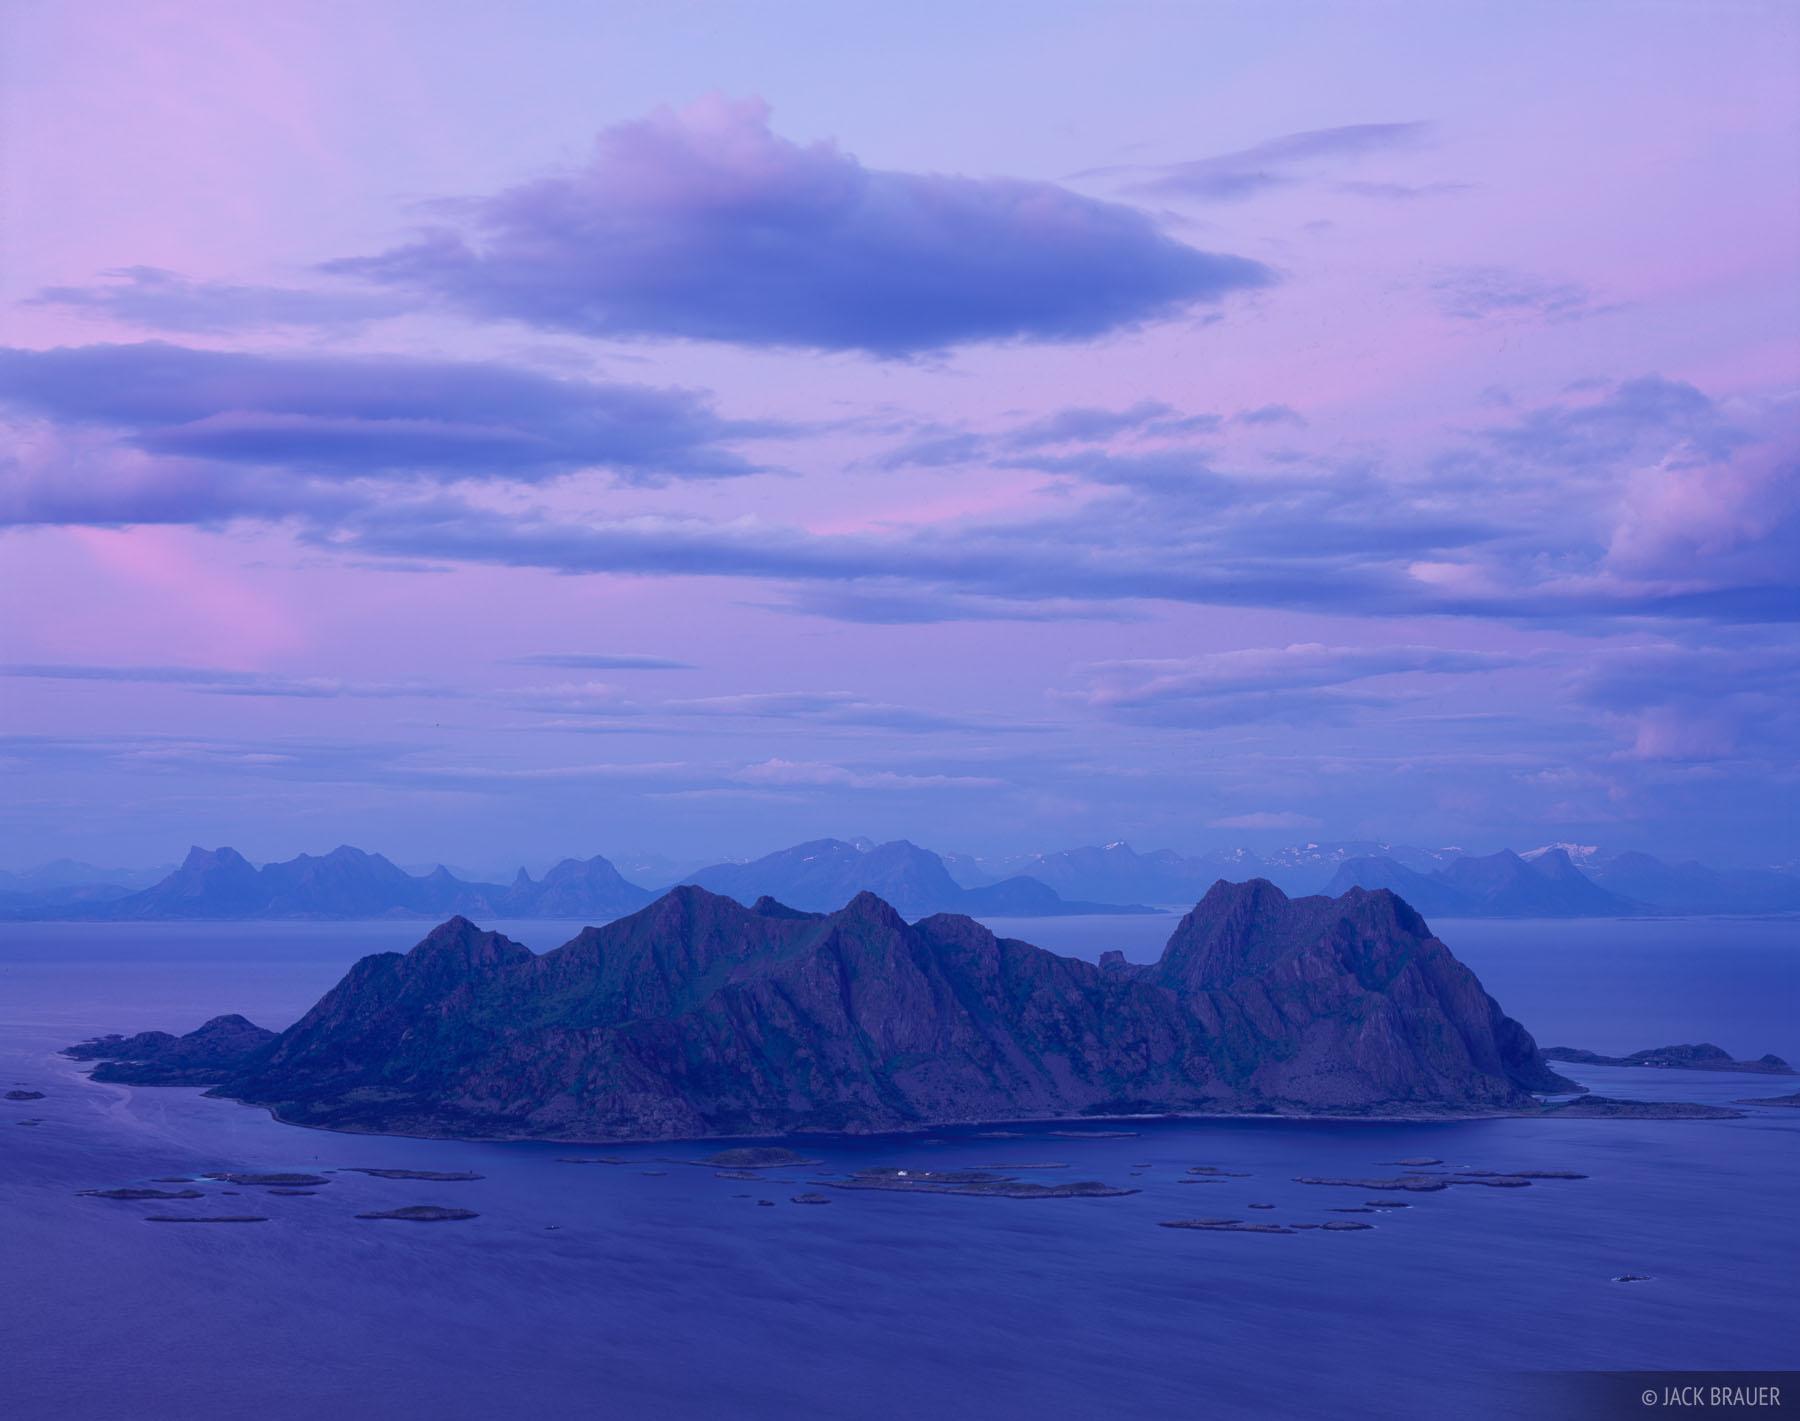 Litlmolla, Fløya, Svolvær, Lofoten Islands, Norway, photo